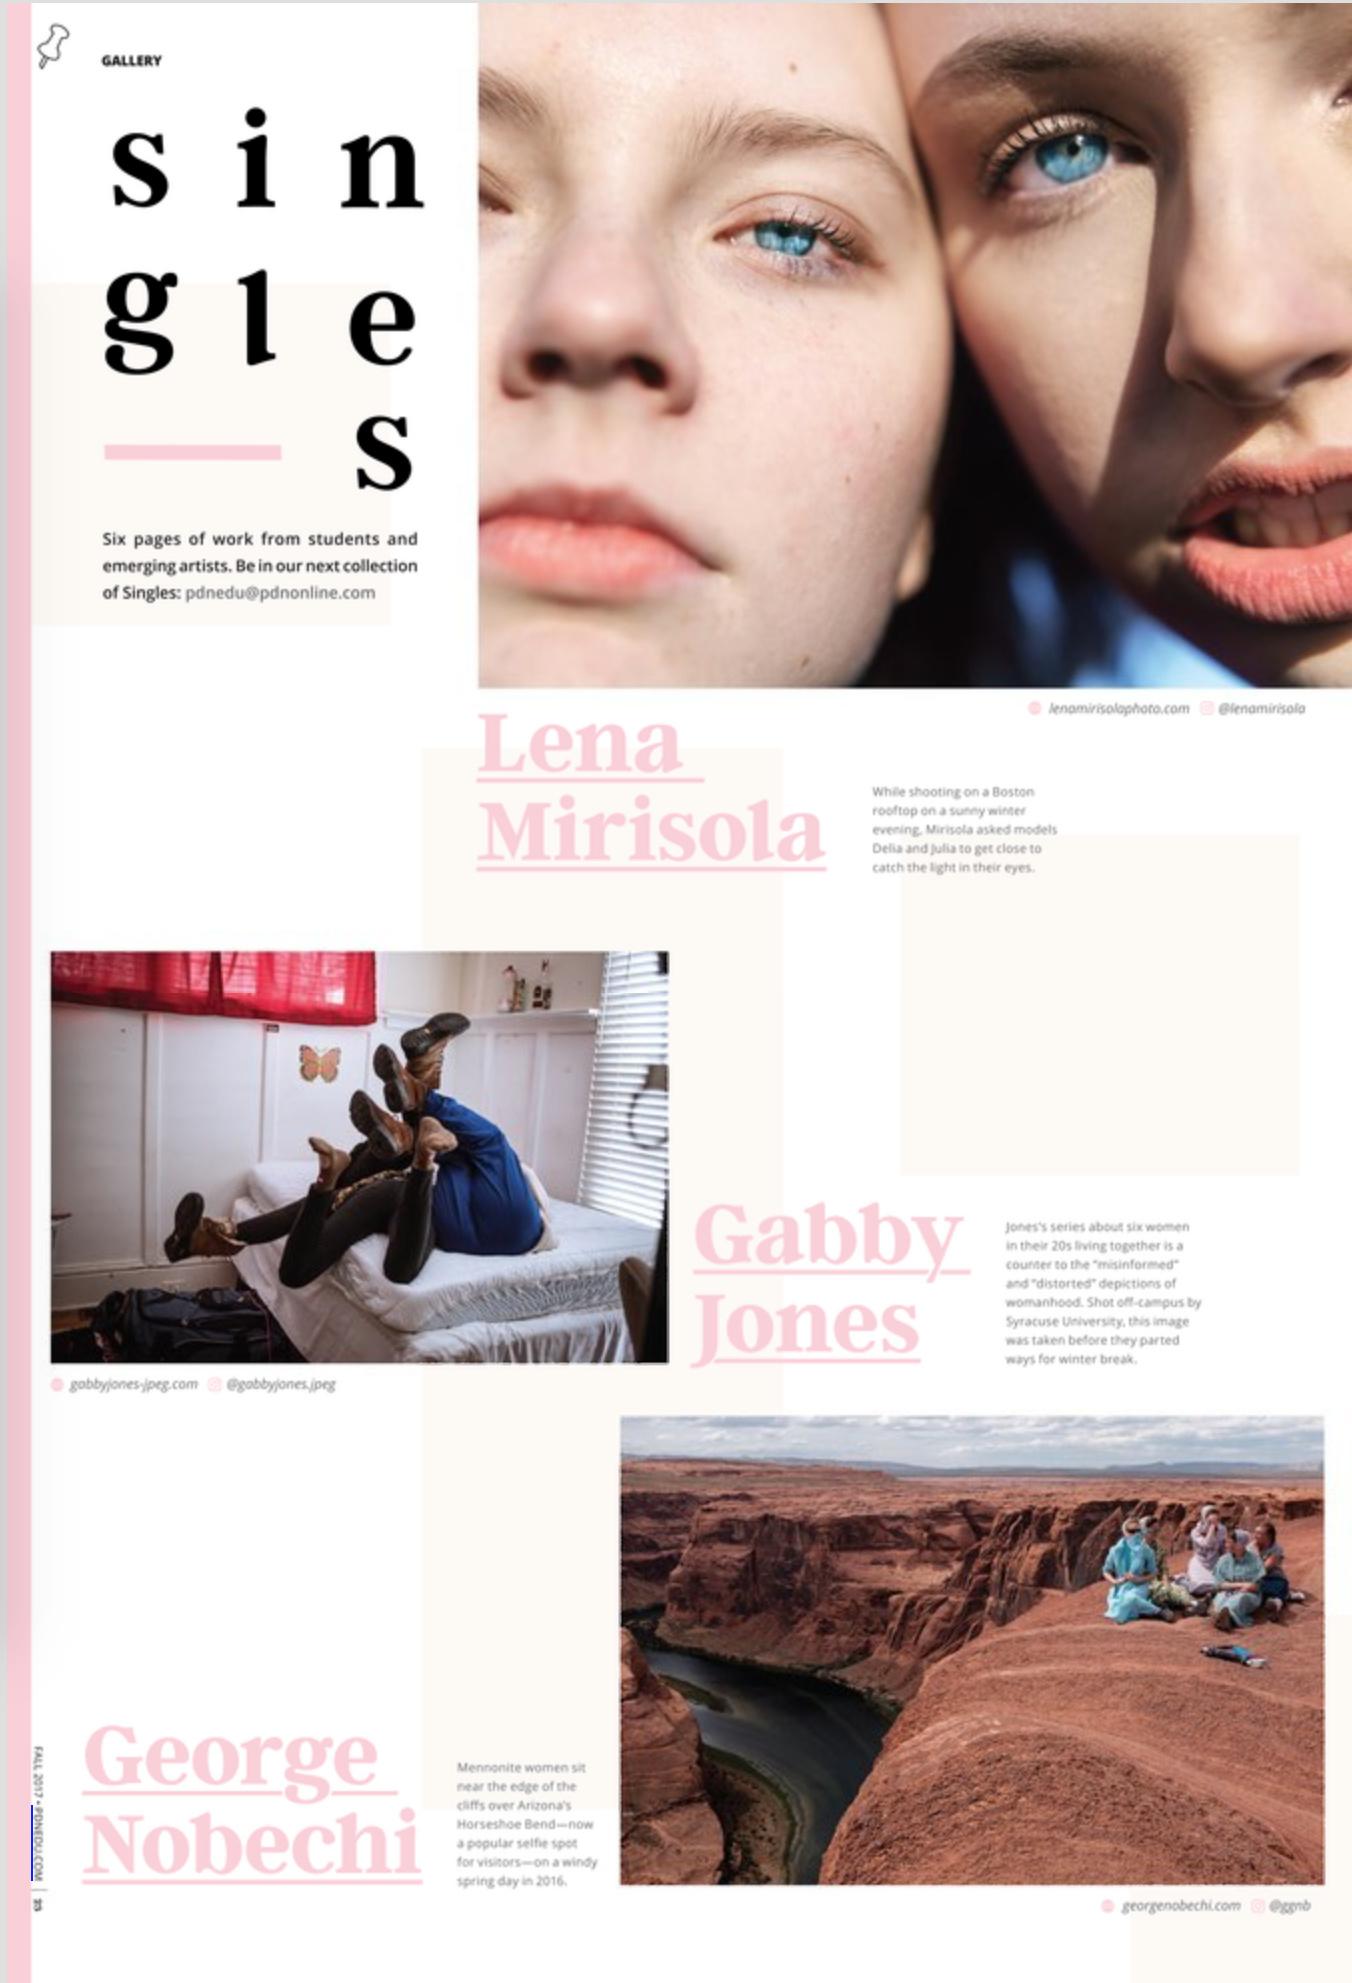 Lena_Mirisola_PDN_Magazine_5.jpg